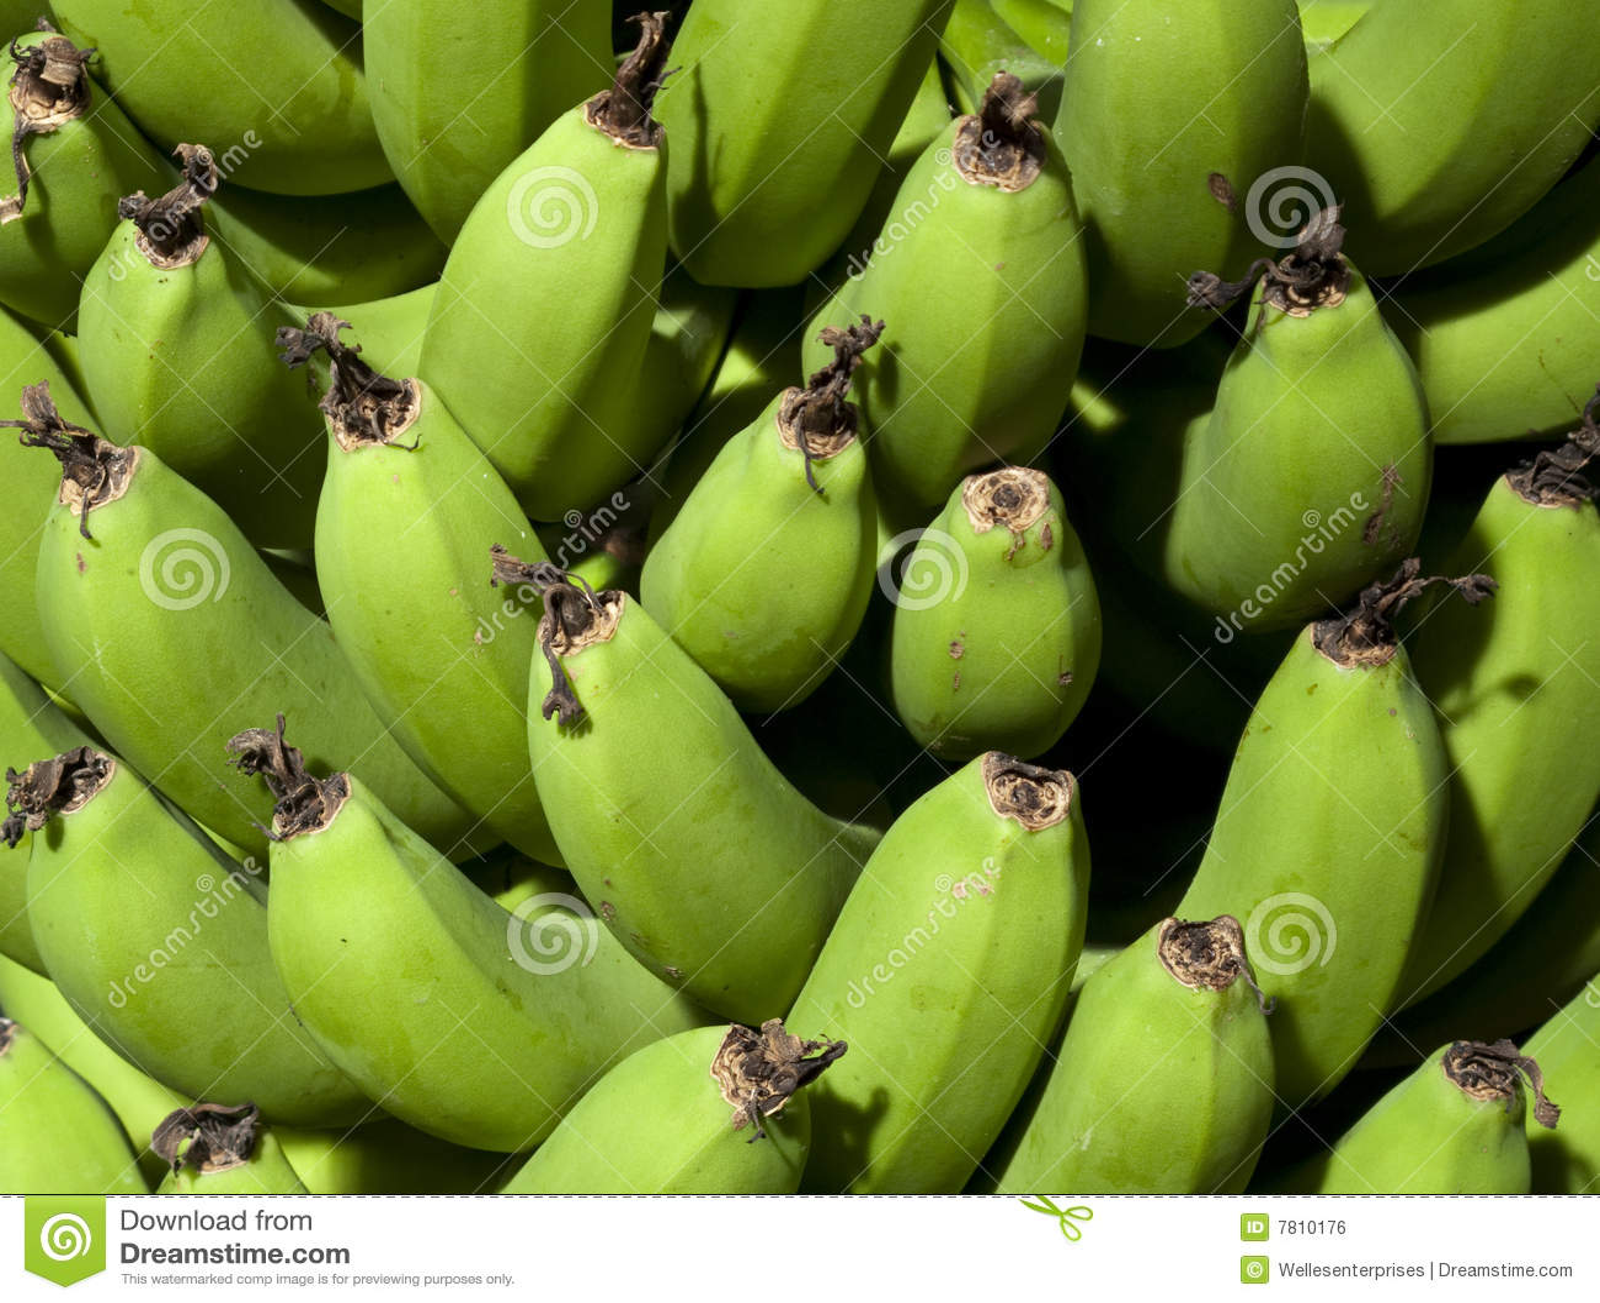 Profitable Banana Farming; Information & Guide for Beginners